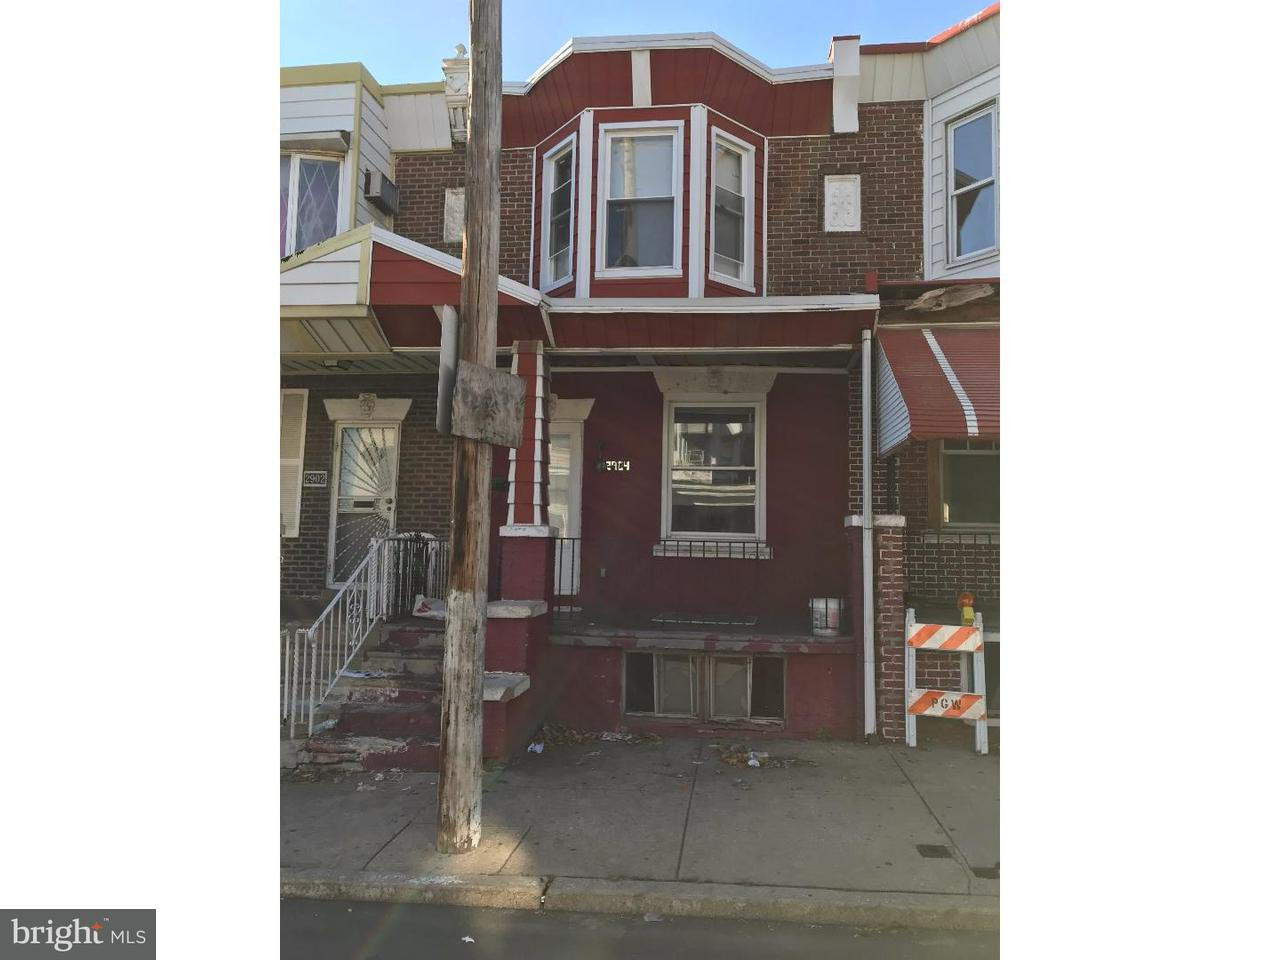 2904 N Bailey Philadelphia, PA 19132